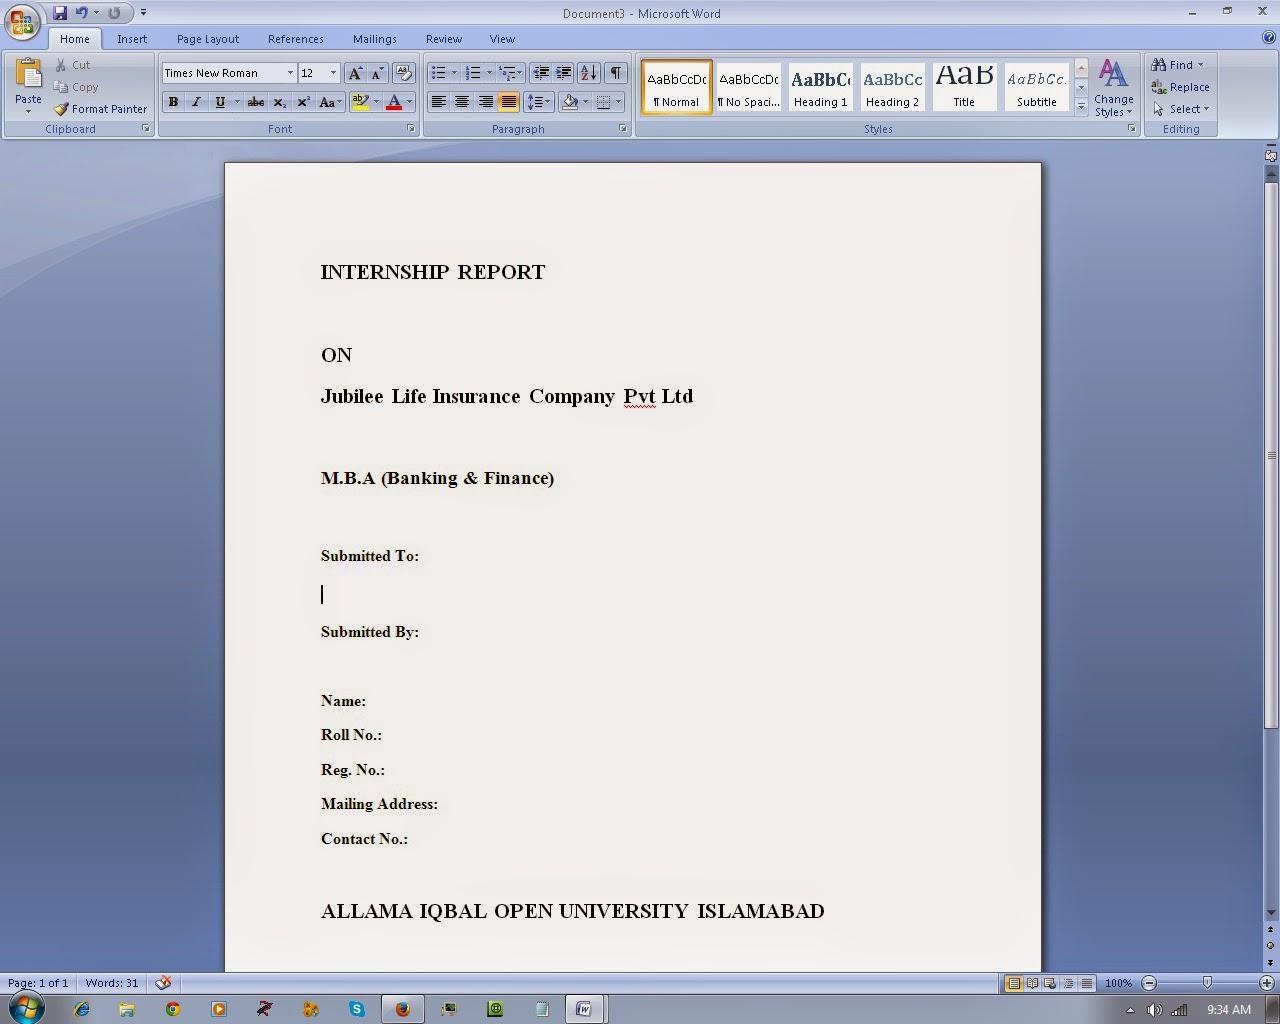 Internship Report Avaliable(Jubliee Life Insurance Company)